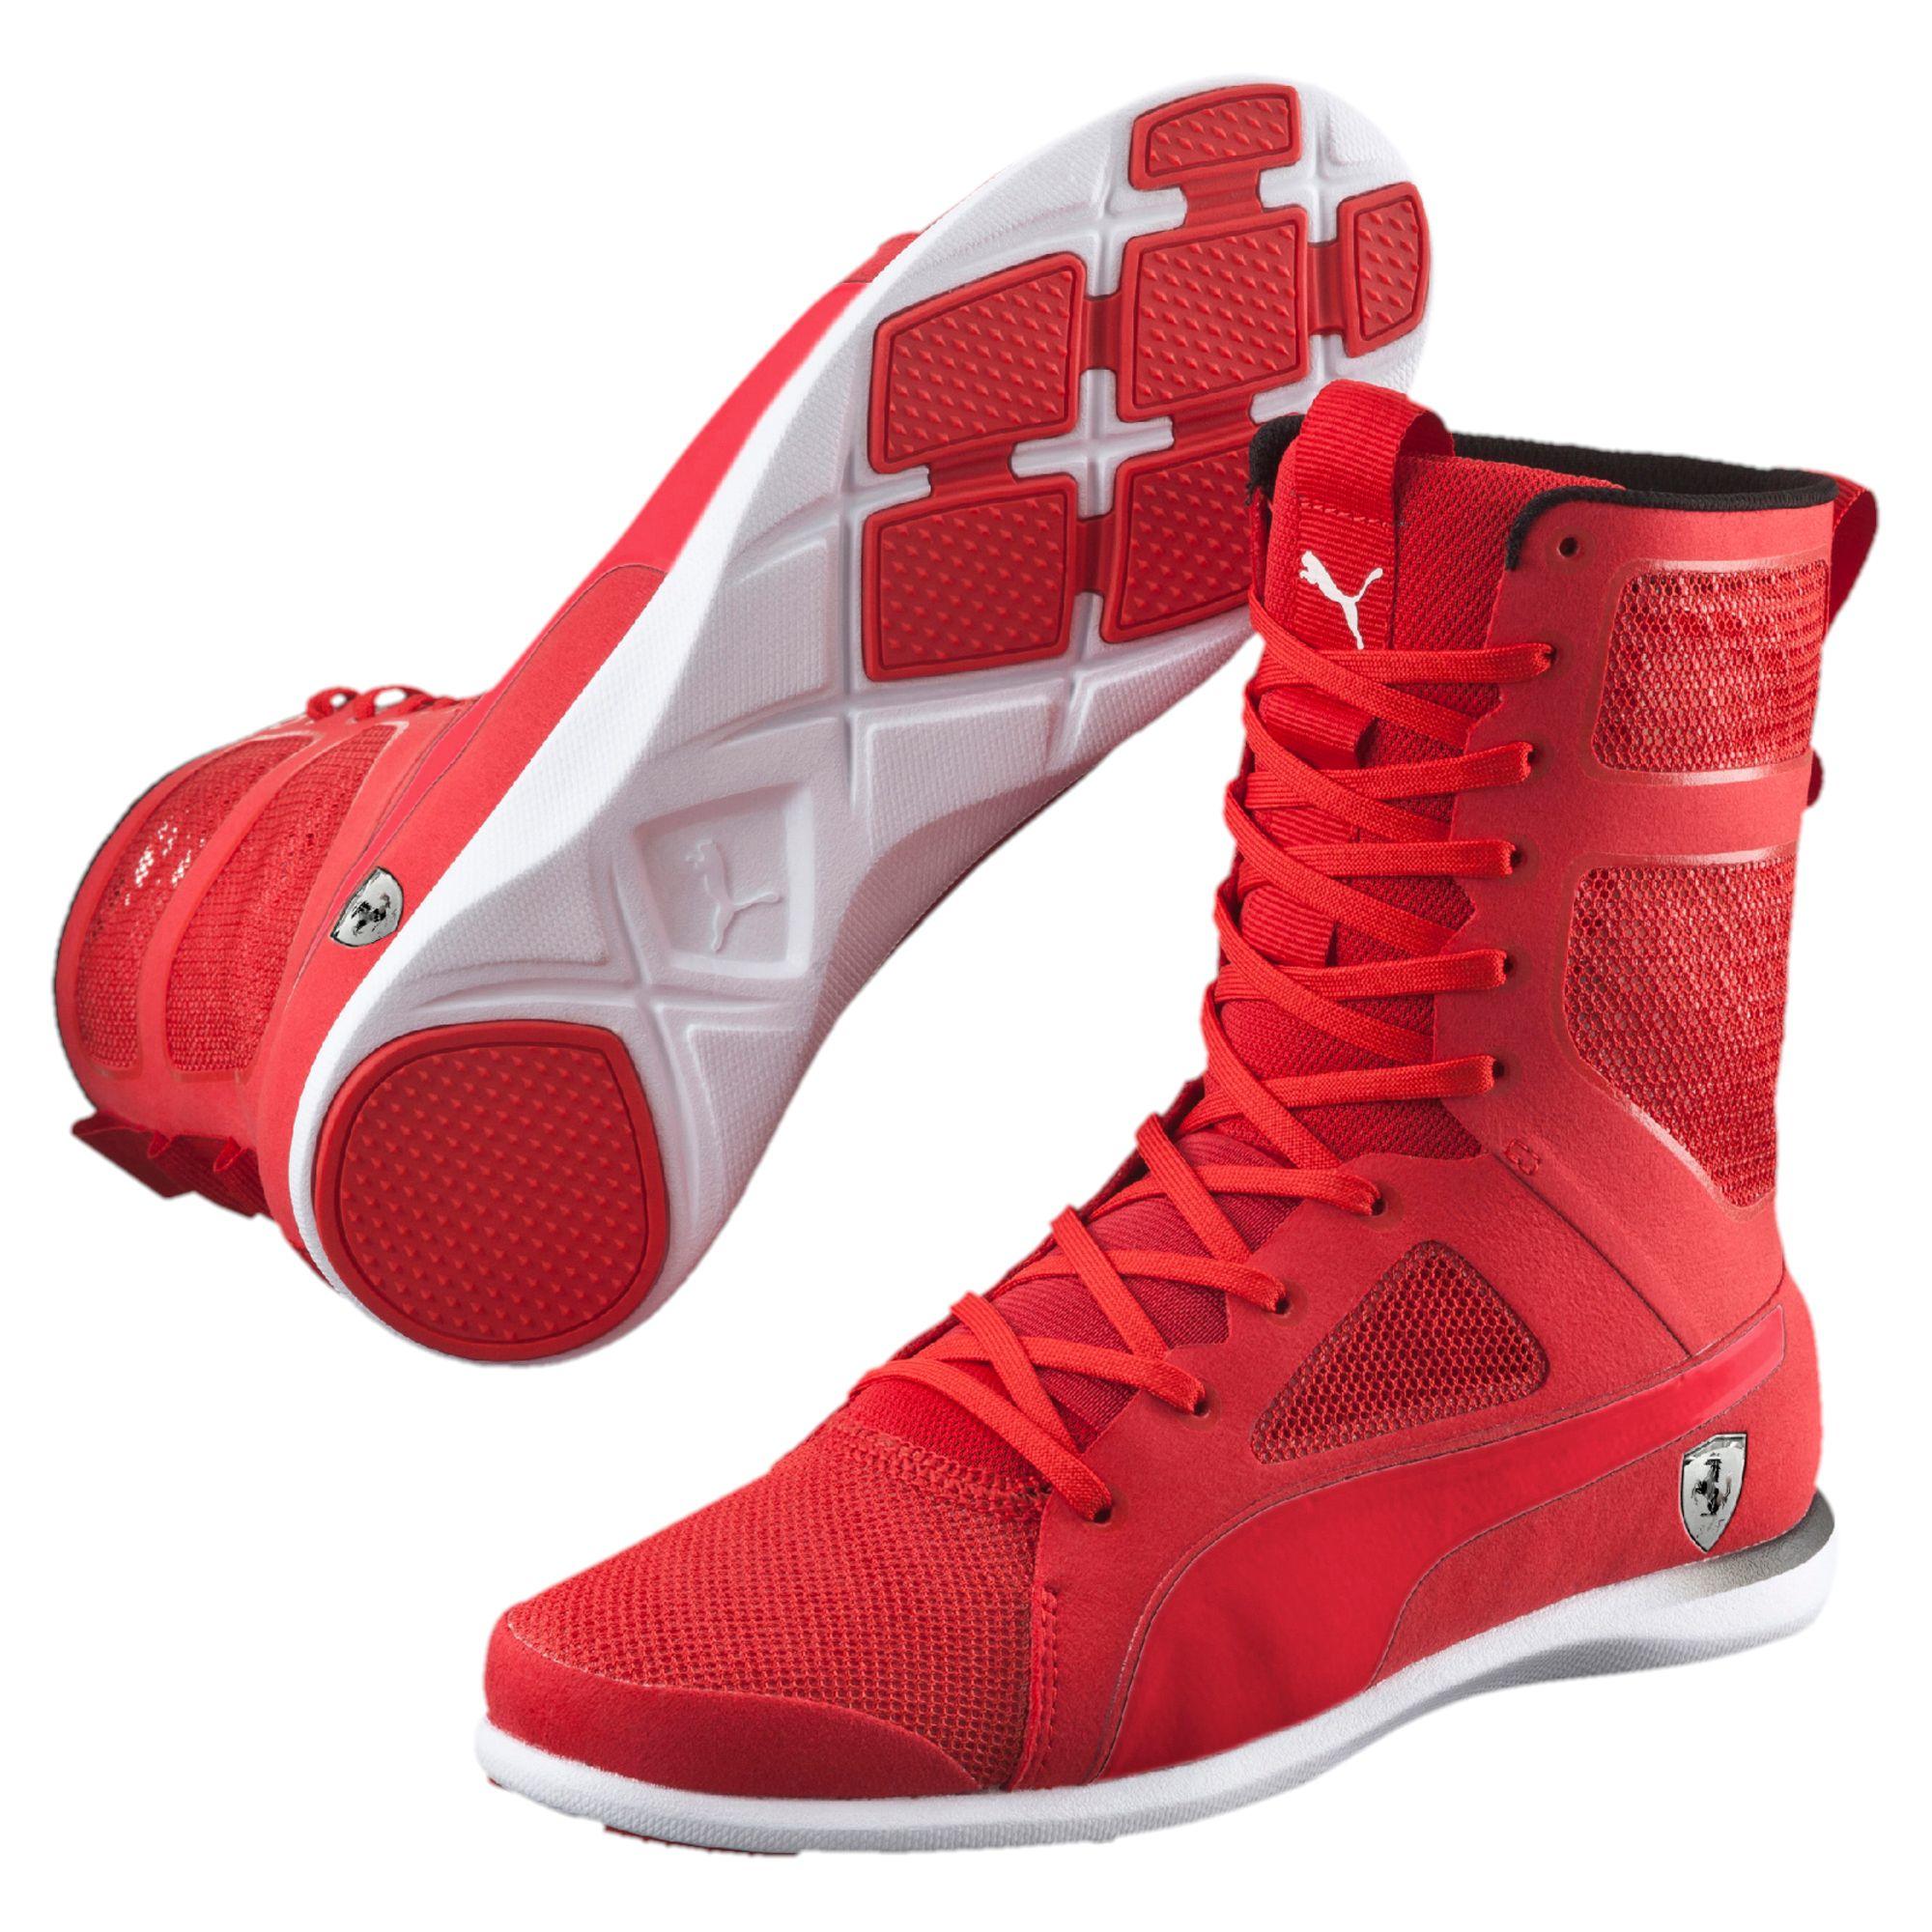 0d98aa5f4a15f9 ... where to buy lyst puma ferrari womens high boot ddd41 74520